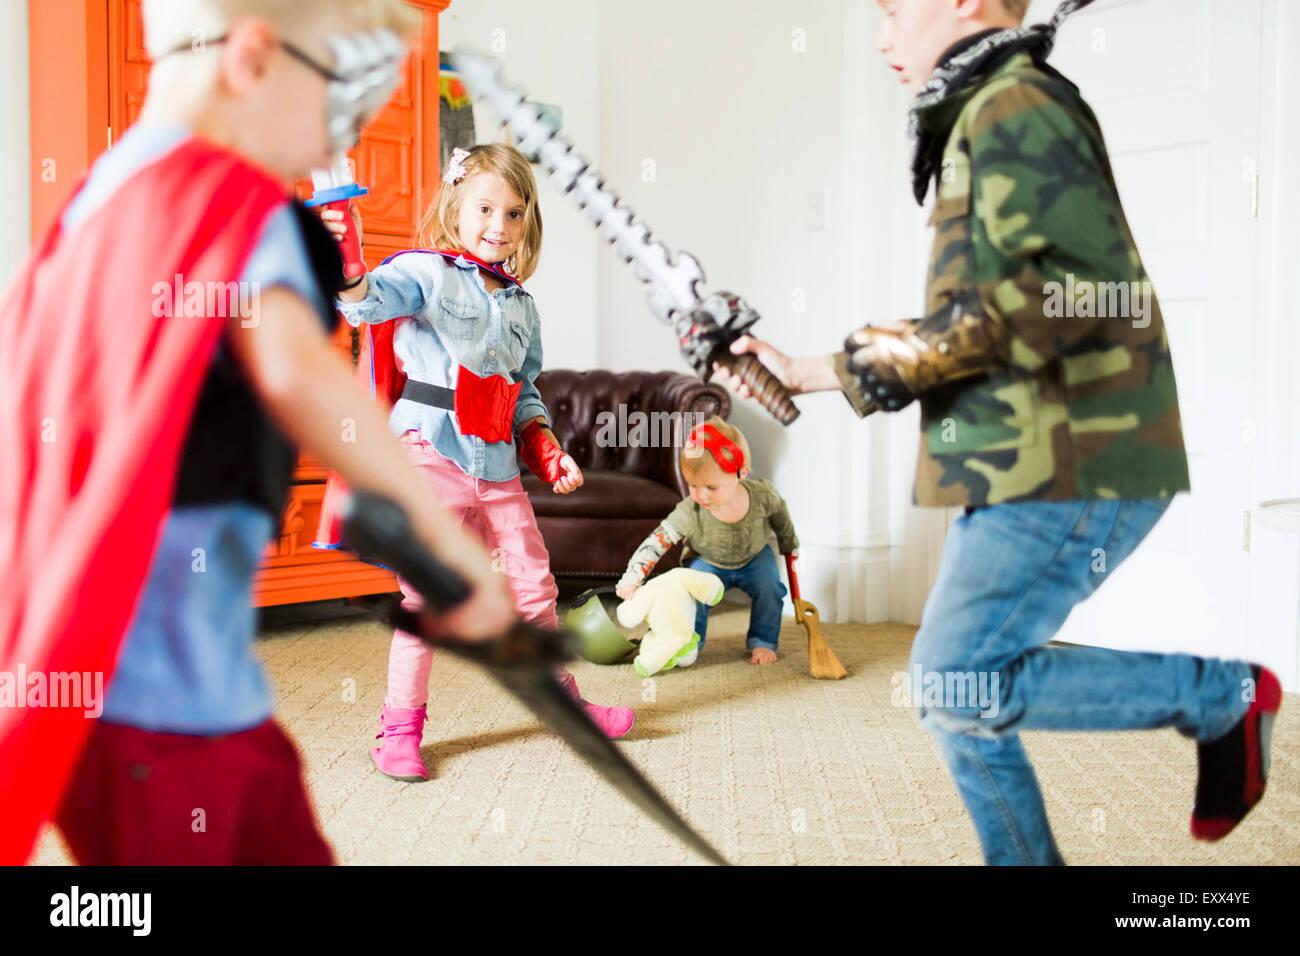 Children (2-3, 4-5, 6-7) wearing superhero costumes playing at home - Stock Image